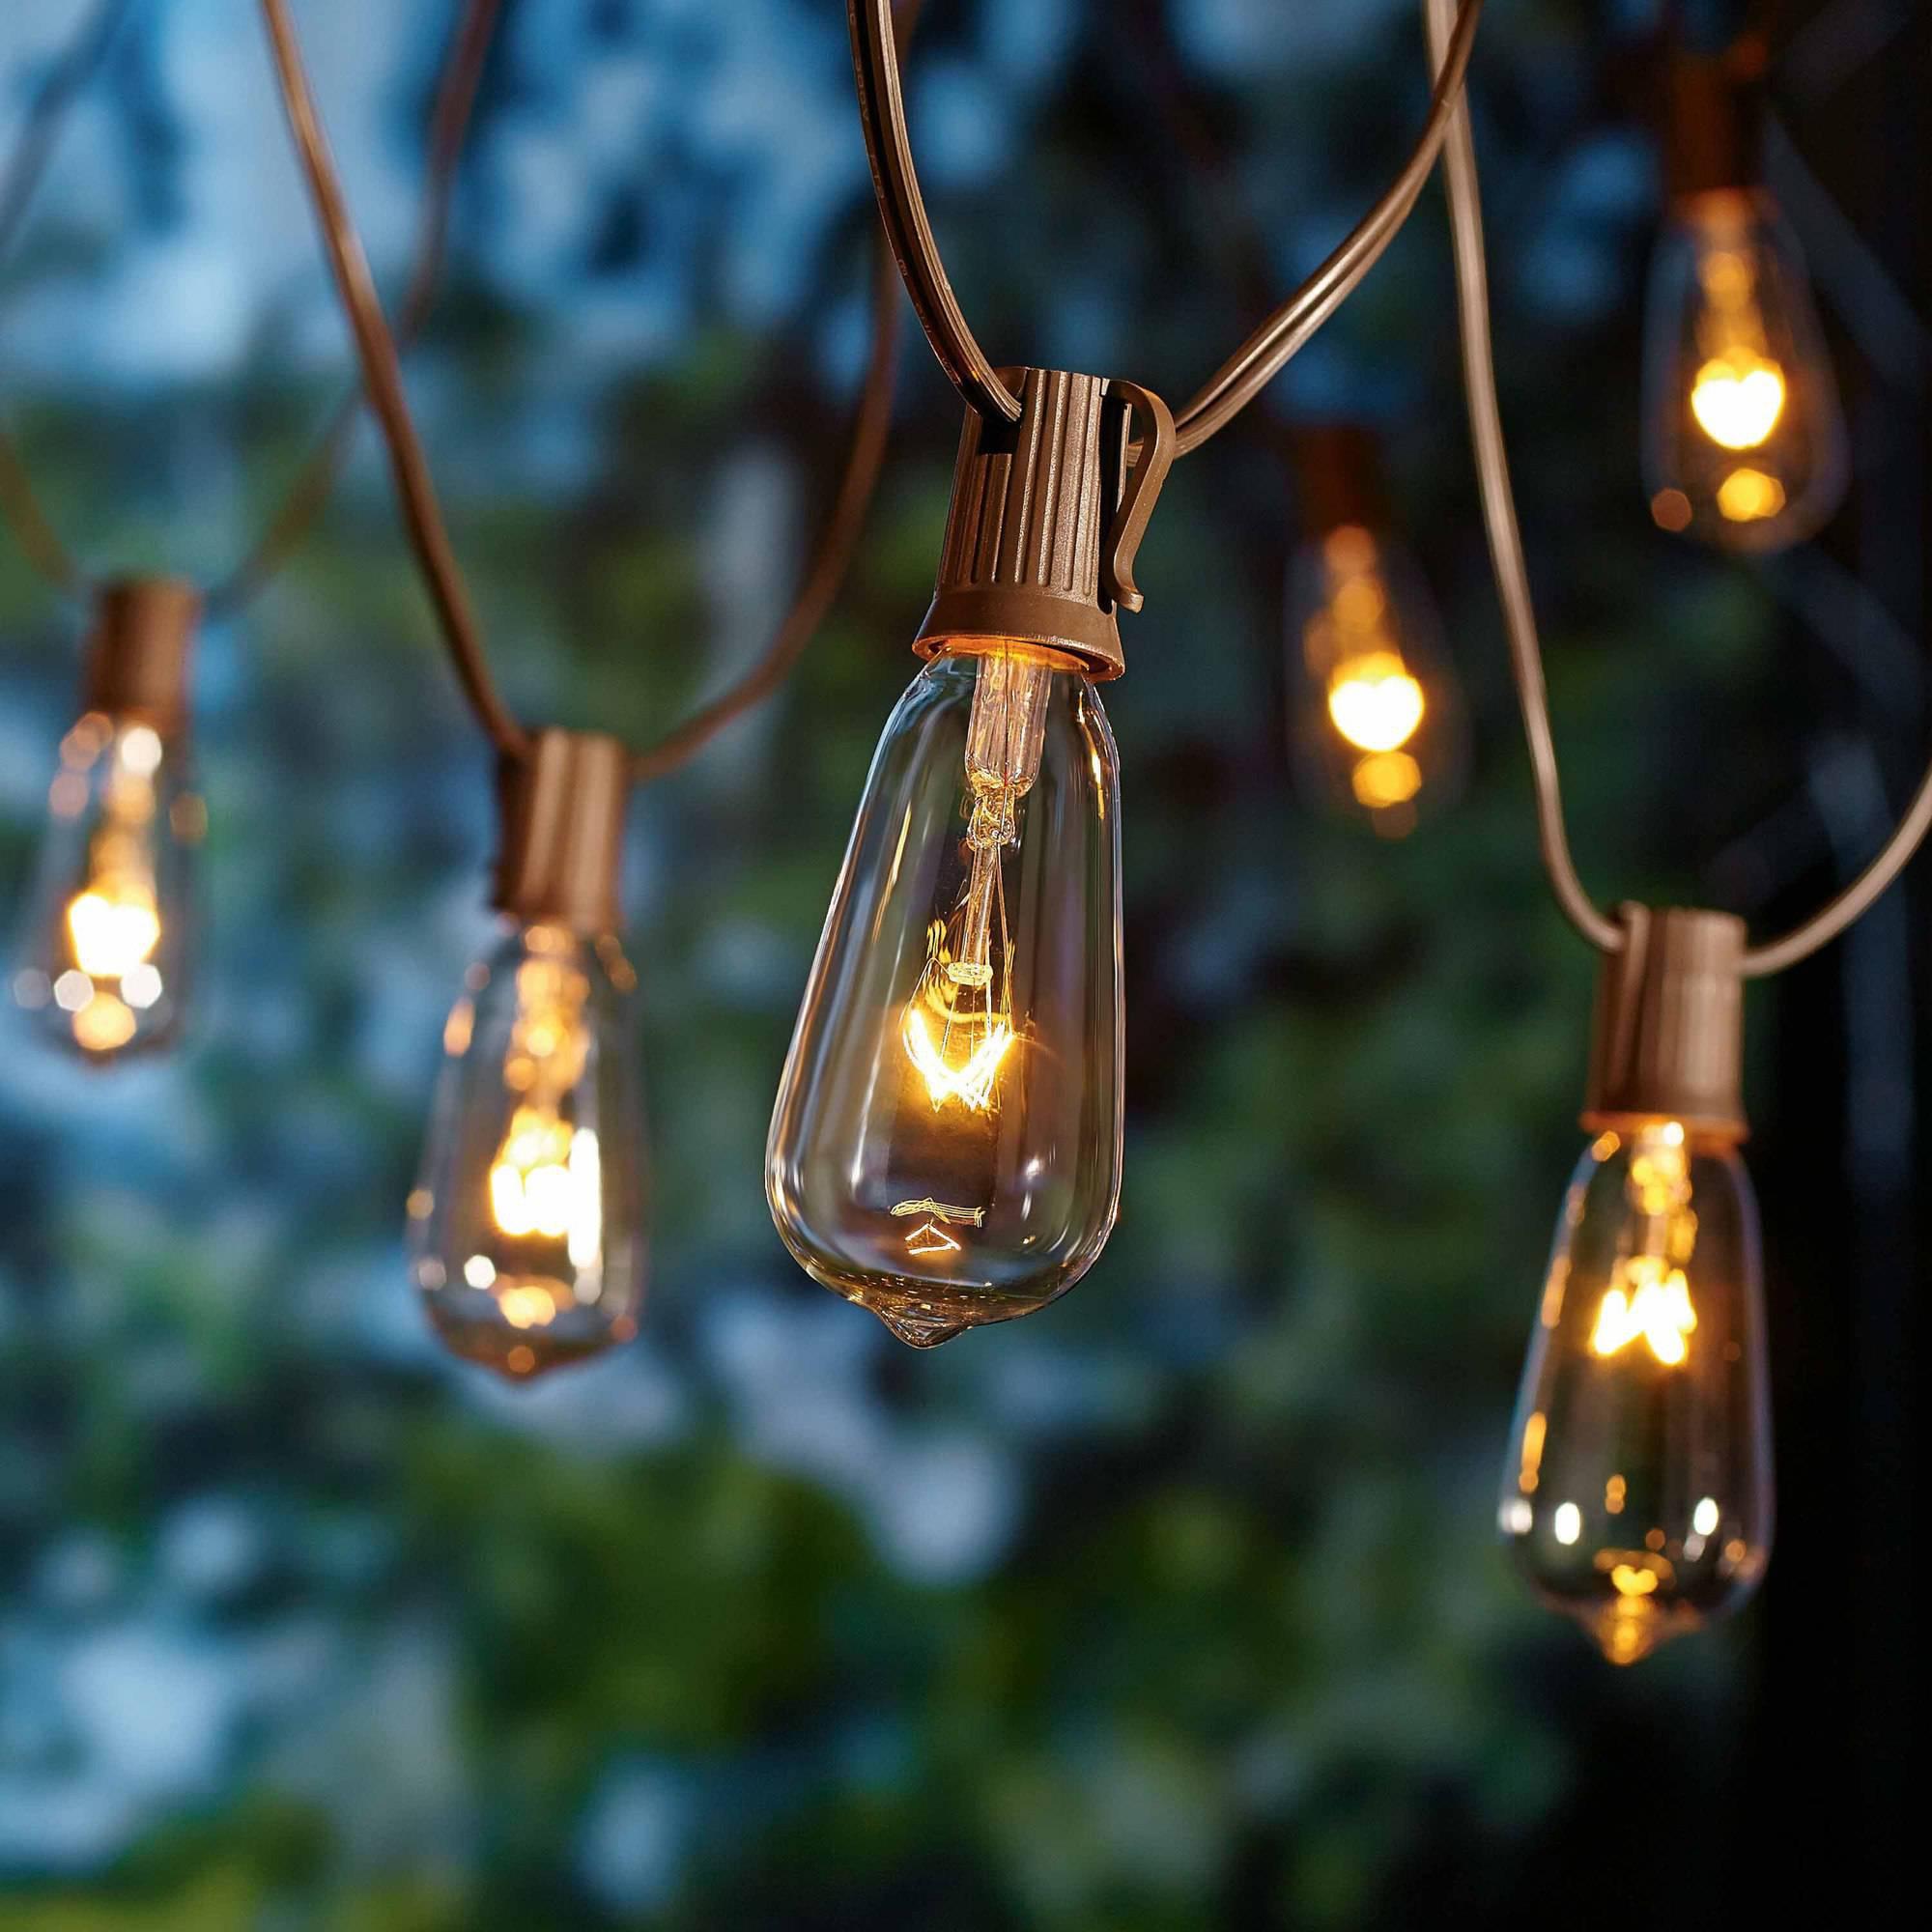 Garden light clipart clipground lighting lighting fixtures garden lights clipart arubaitofo Choice Image